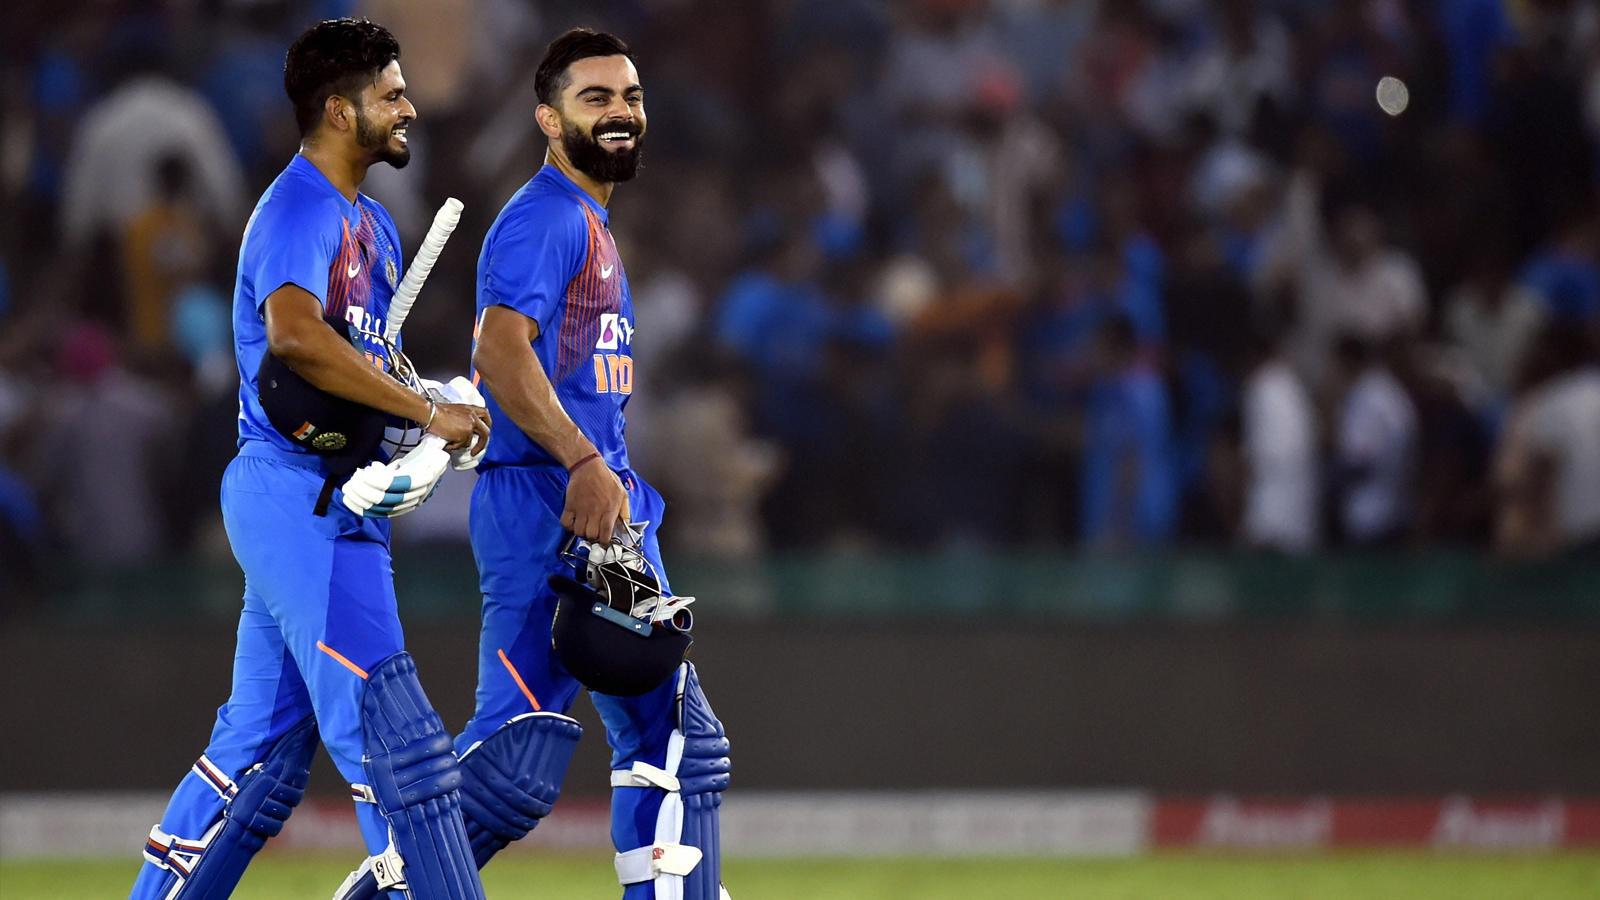 india-vs-sa-2nd-t20i-kohlis-72-powers-india-to-victory